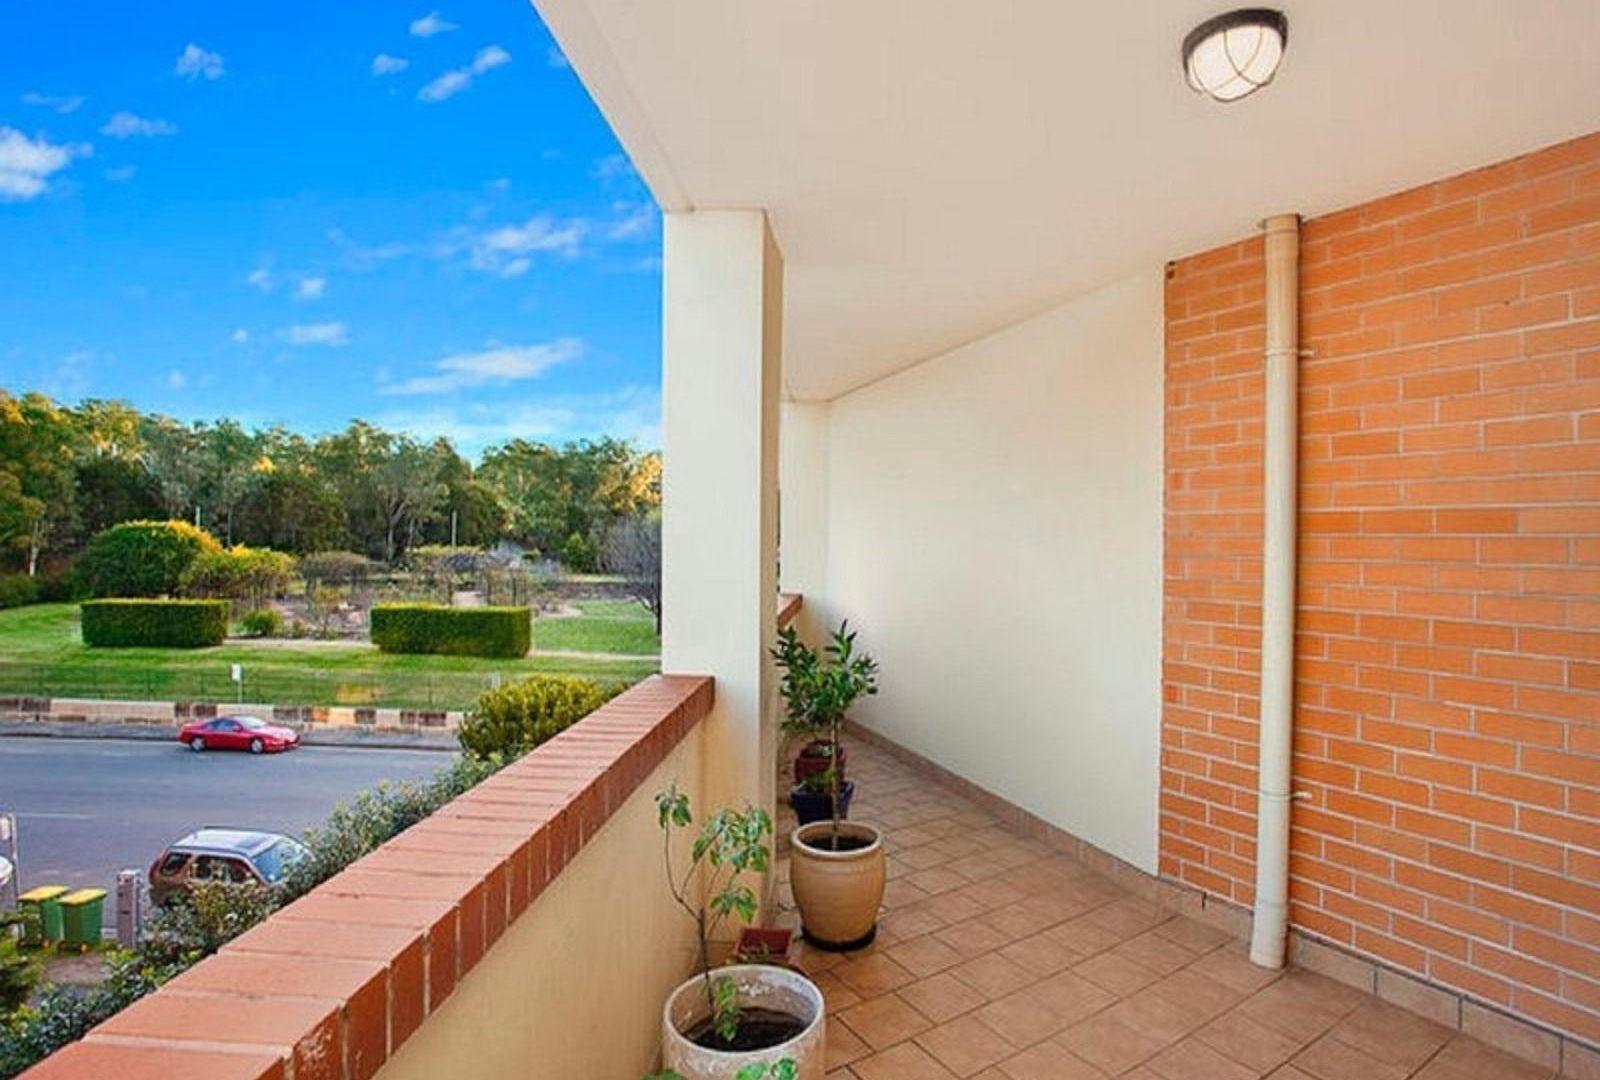 14/1 Macquarie Street, Parramatta NSW 2150, Image 2